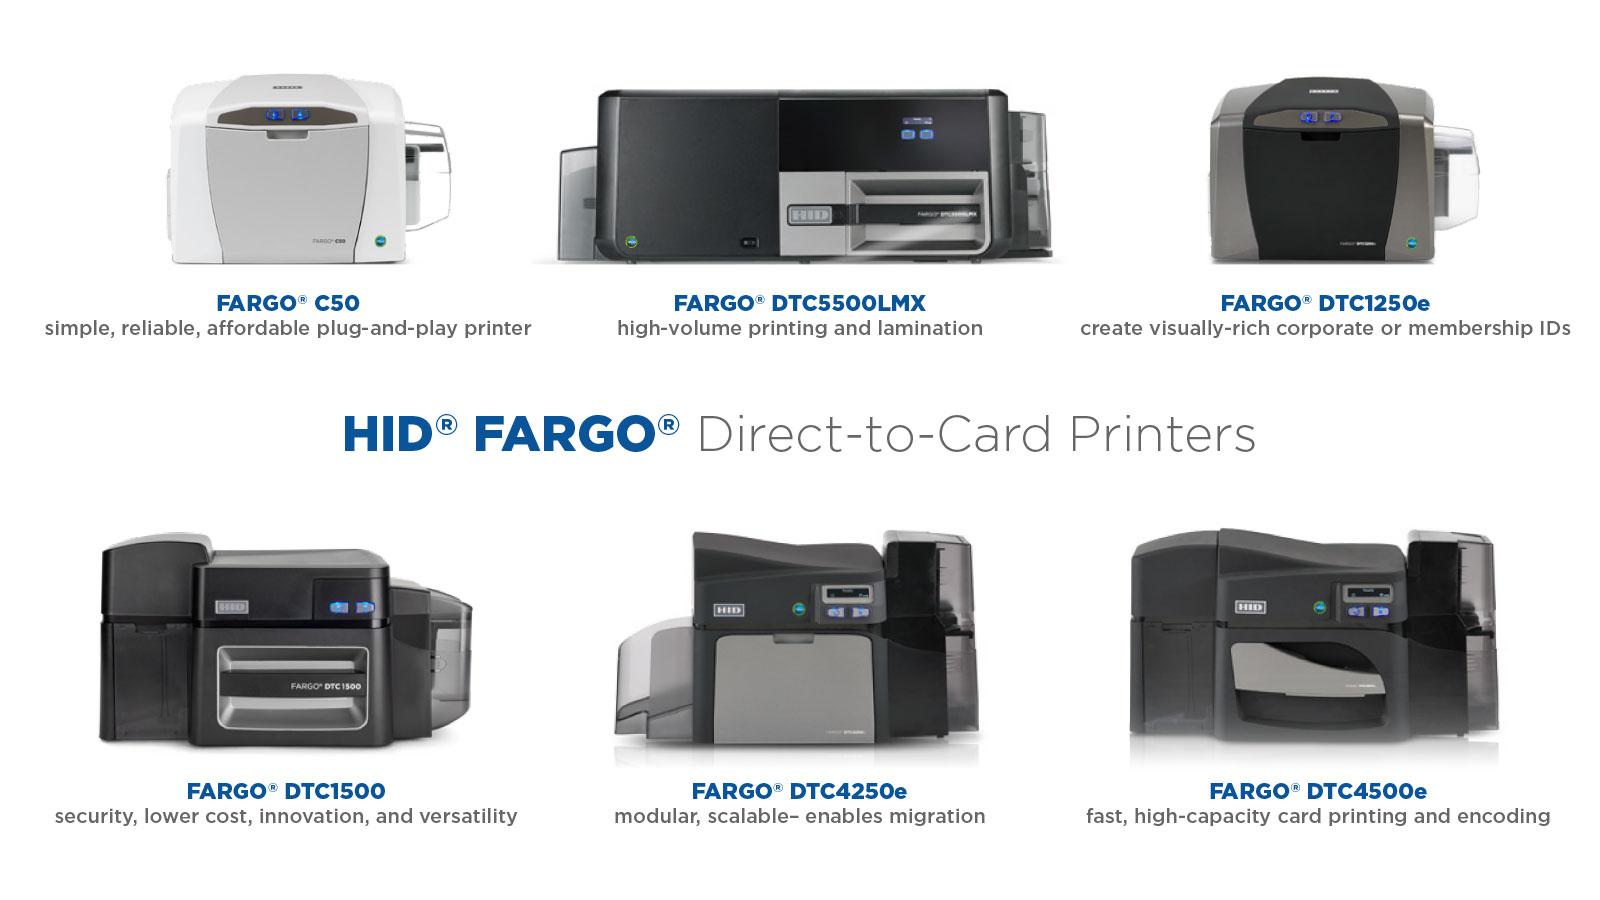 Fargo ID Card DTC Printers